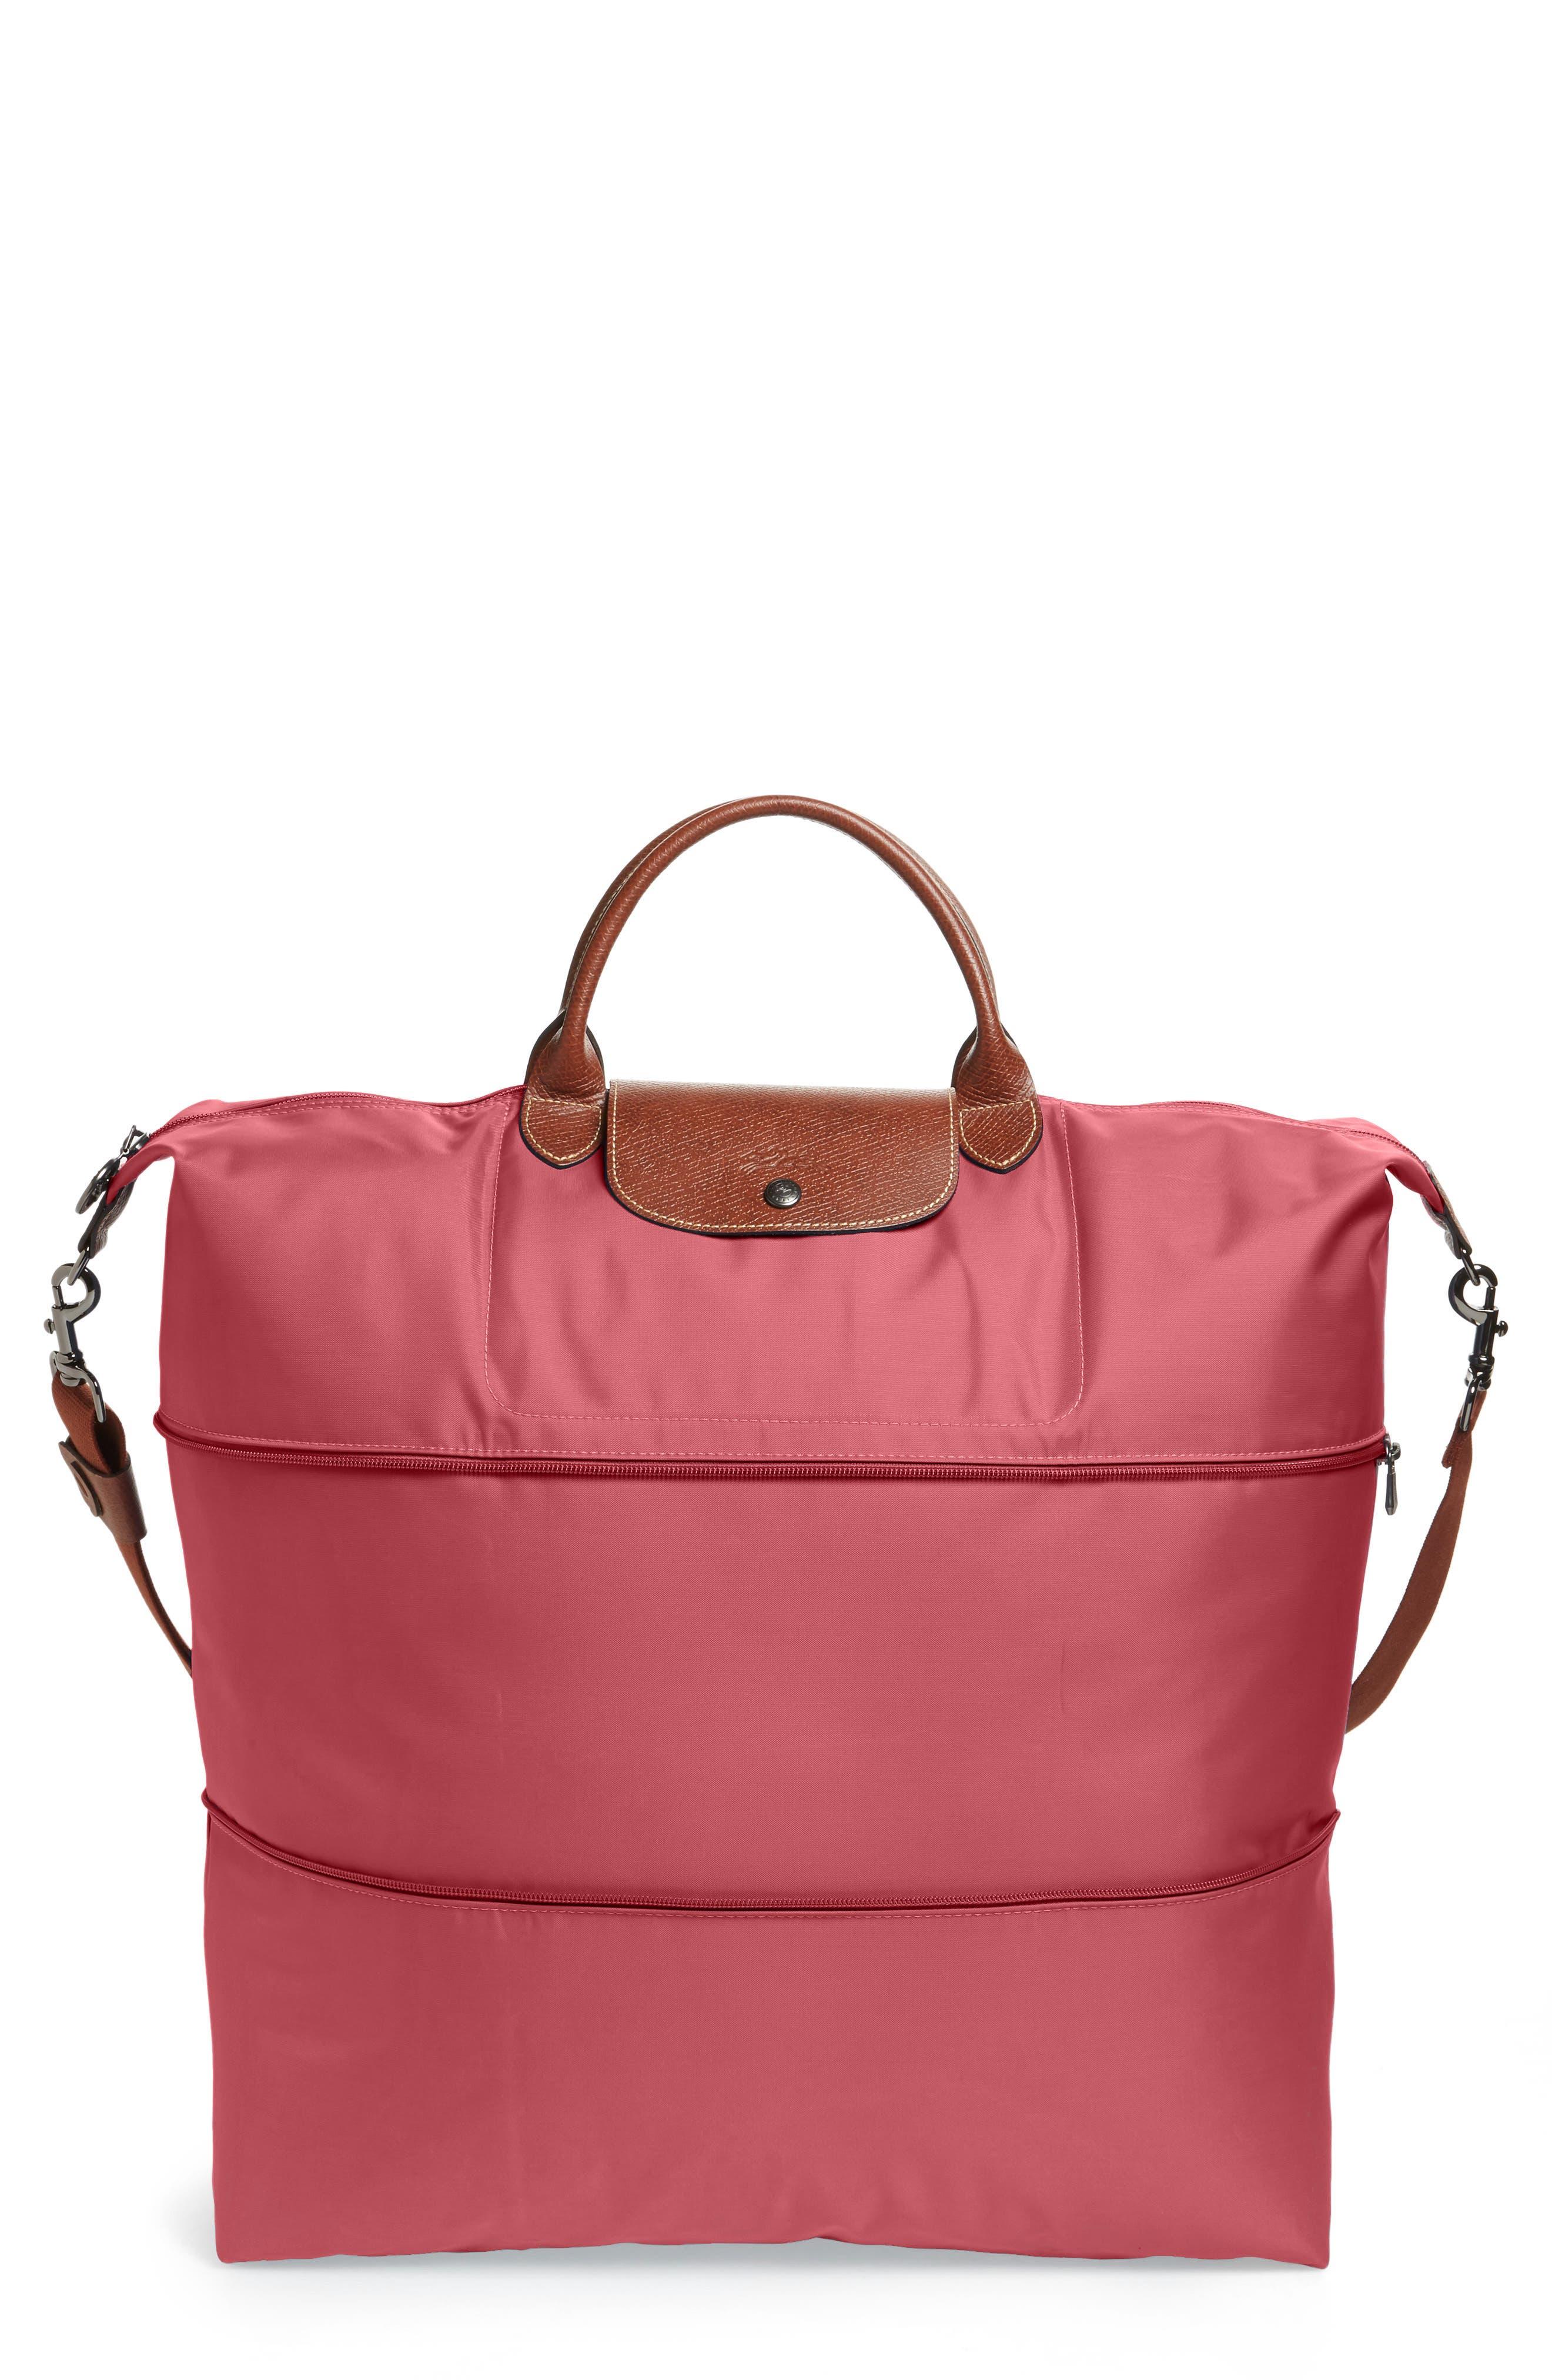 Le Pliage 21-Inch Expandable Travel Bag,                             Main thumbnail 1, color,                             FIG